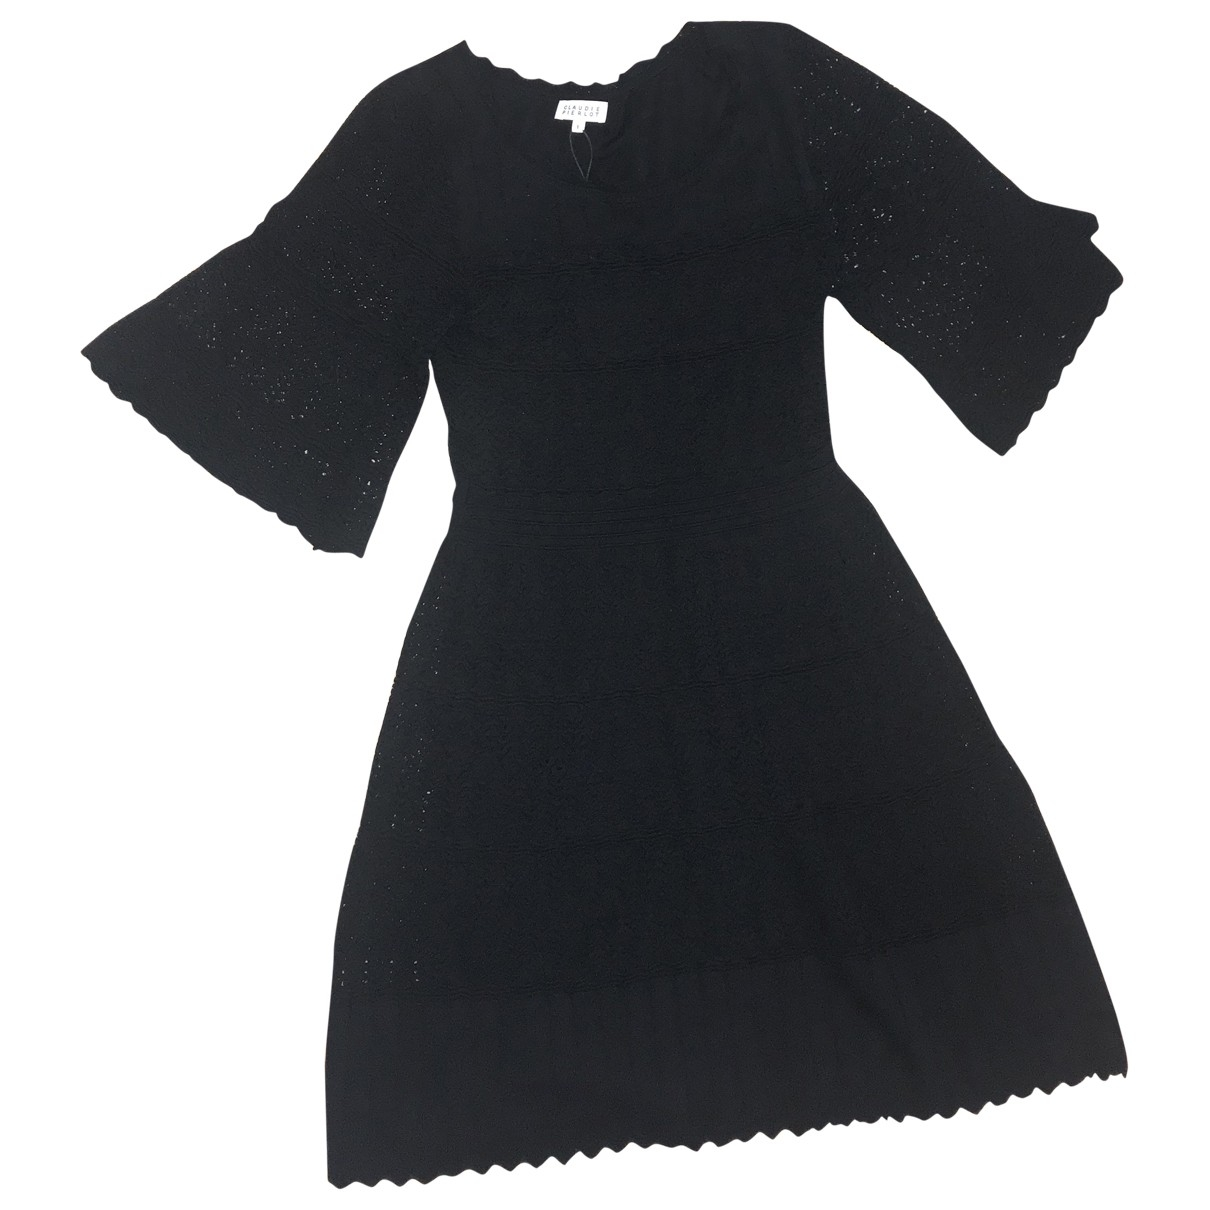 Claudie Pierlot Spring Summer 2019 Black dress for Women 36 FR